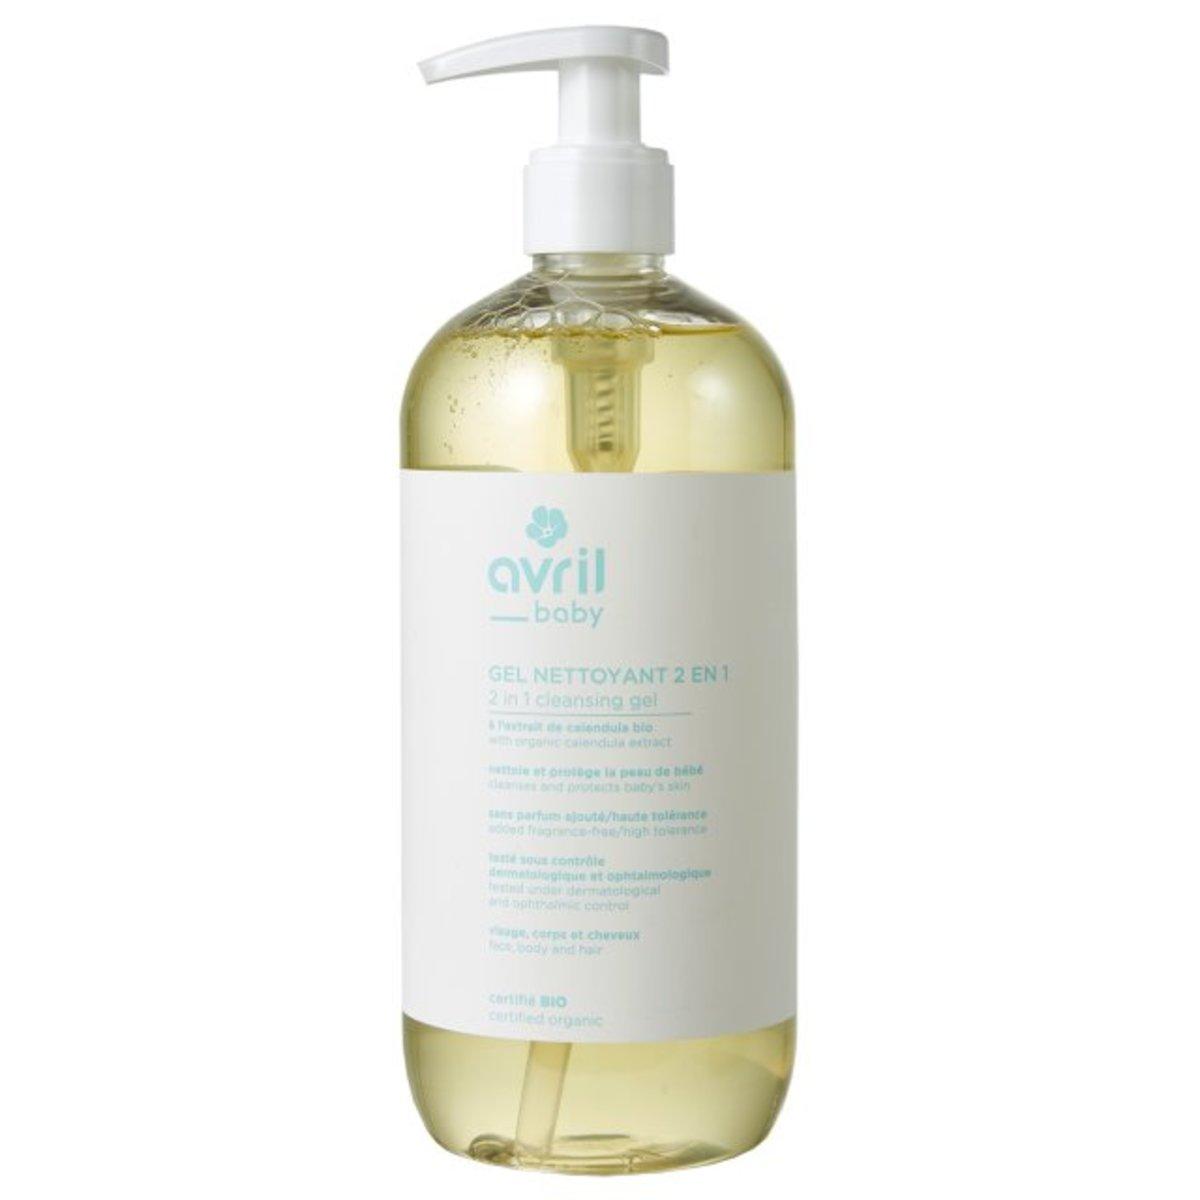 Organic Baby Cleansing Body Wash Gel 500ml